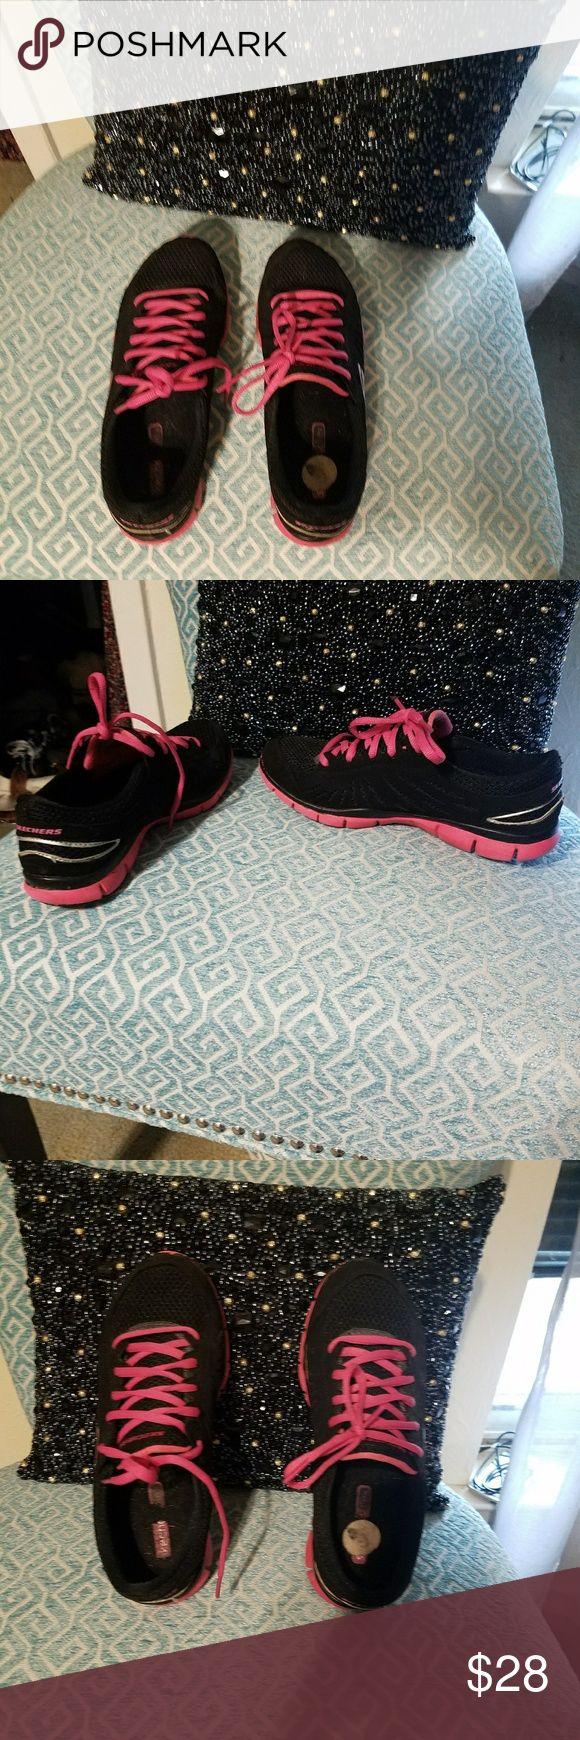 Skechers Sneakers Black with pink skechers. Good condition. Skechers Shoes Sneakers